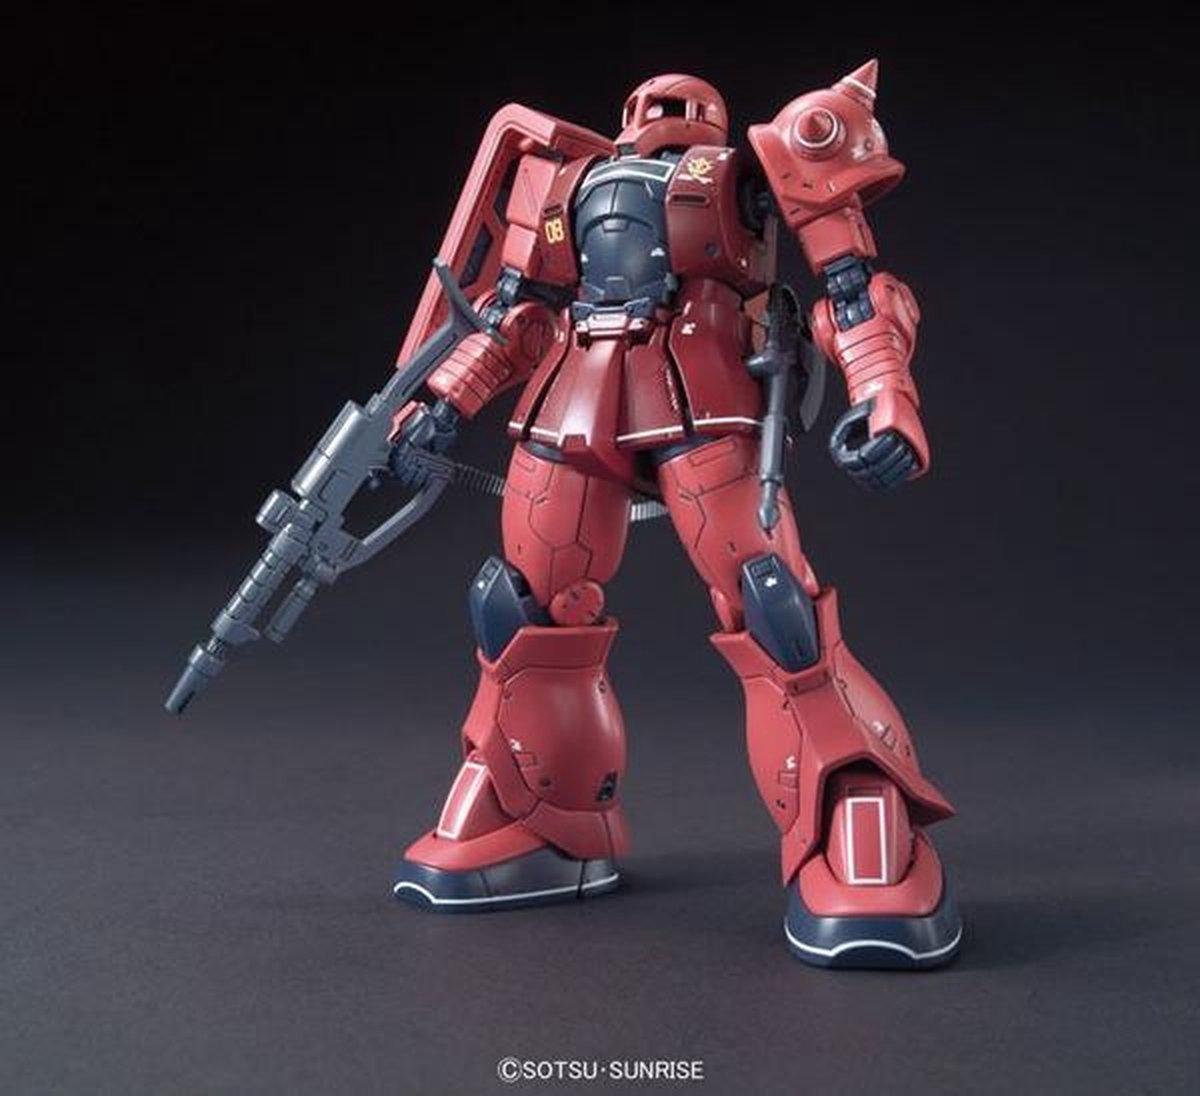 Gundam The Origin: High Grade - MS-05S Char Aznable s Zaku I 1:144 Model Kit